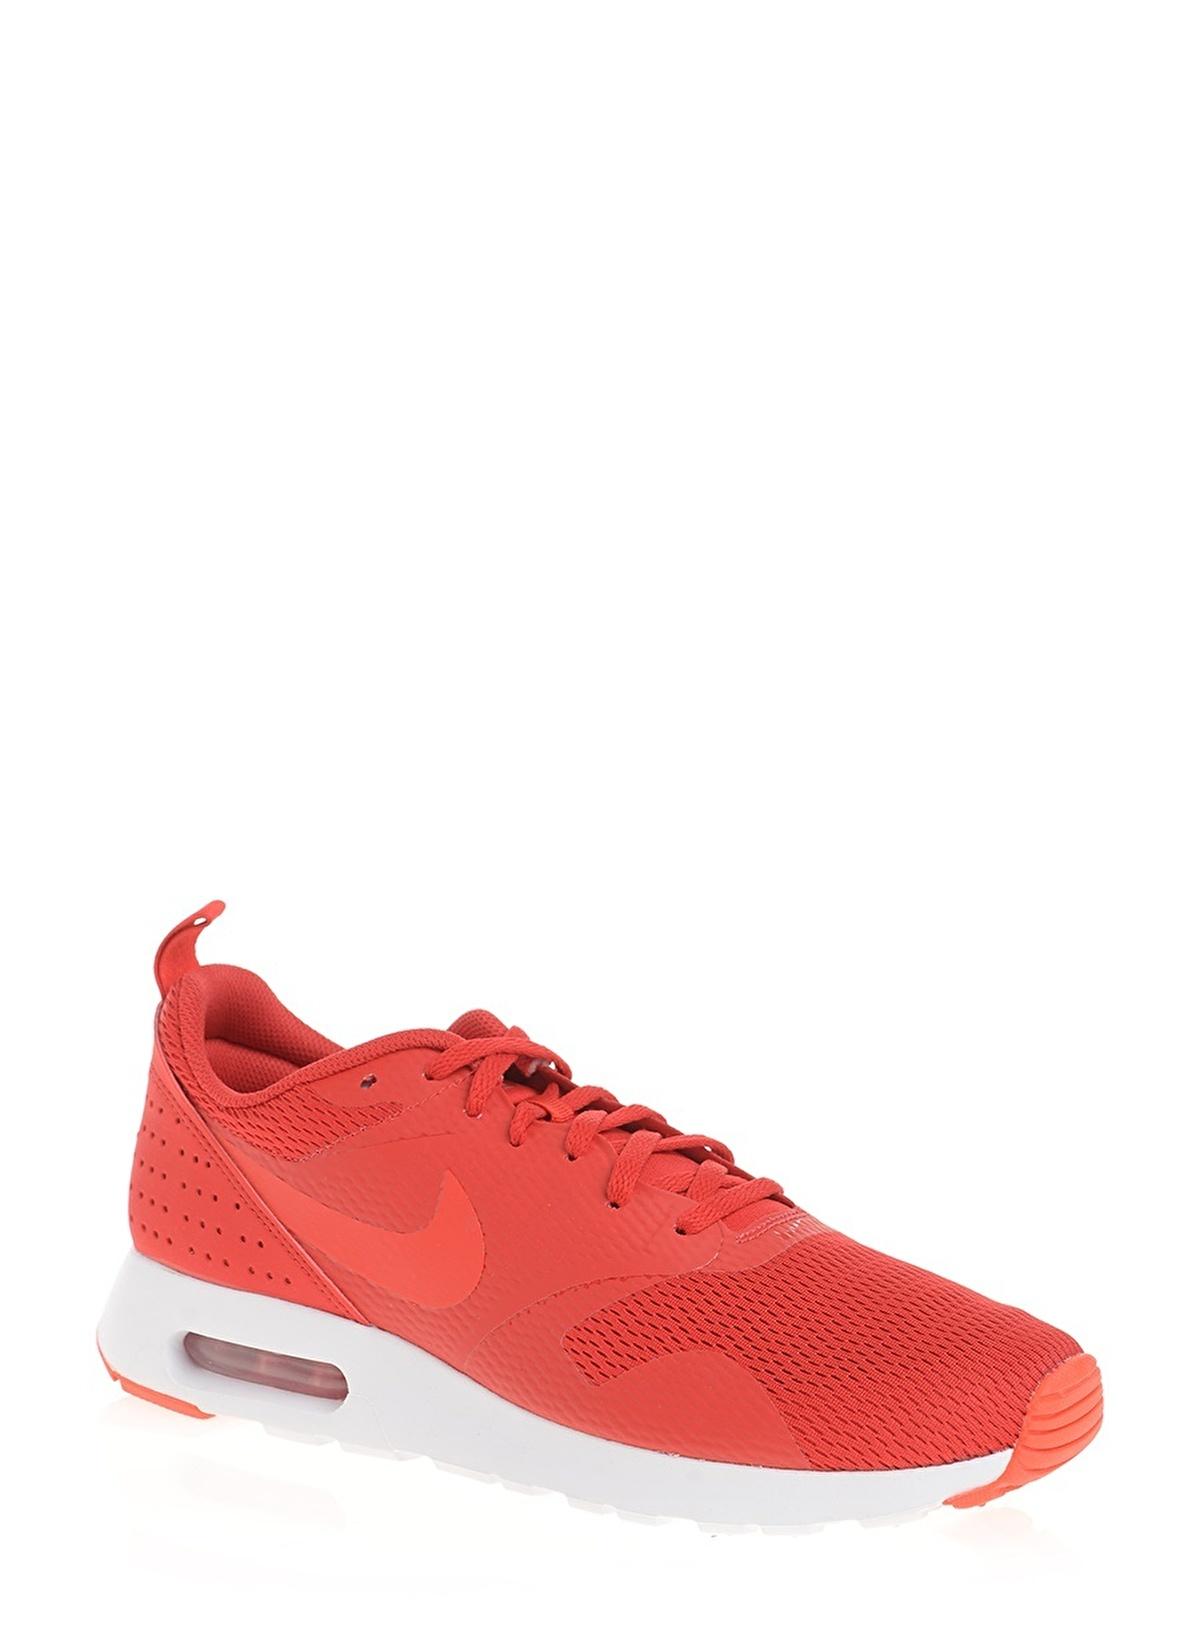 super popular 428df 33d47 Nike Nike Air Max Tavas Kırmızı ...